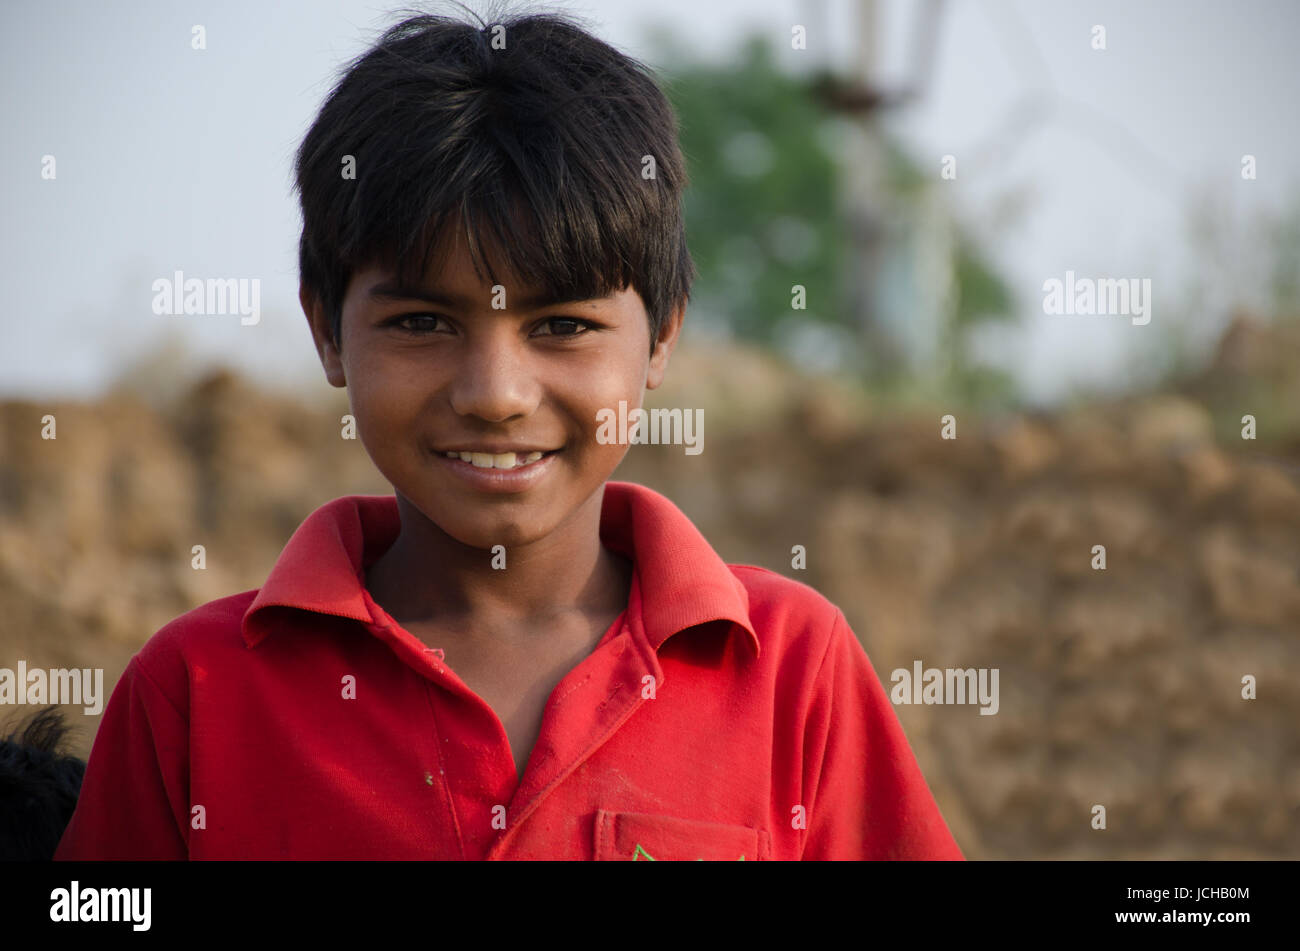 AMRITSAR, PUNJAB, INDIA - 21 APRIL 2017 : portrait of Indian boy smiling Stock Photo